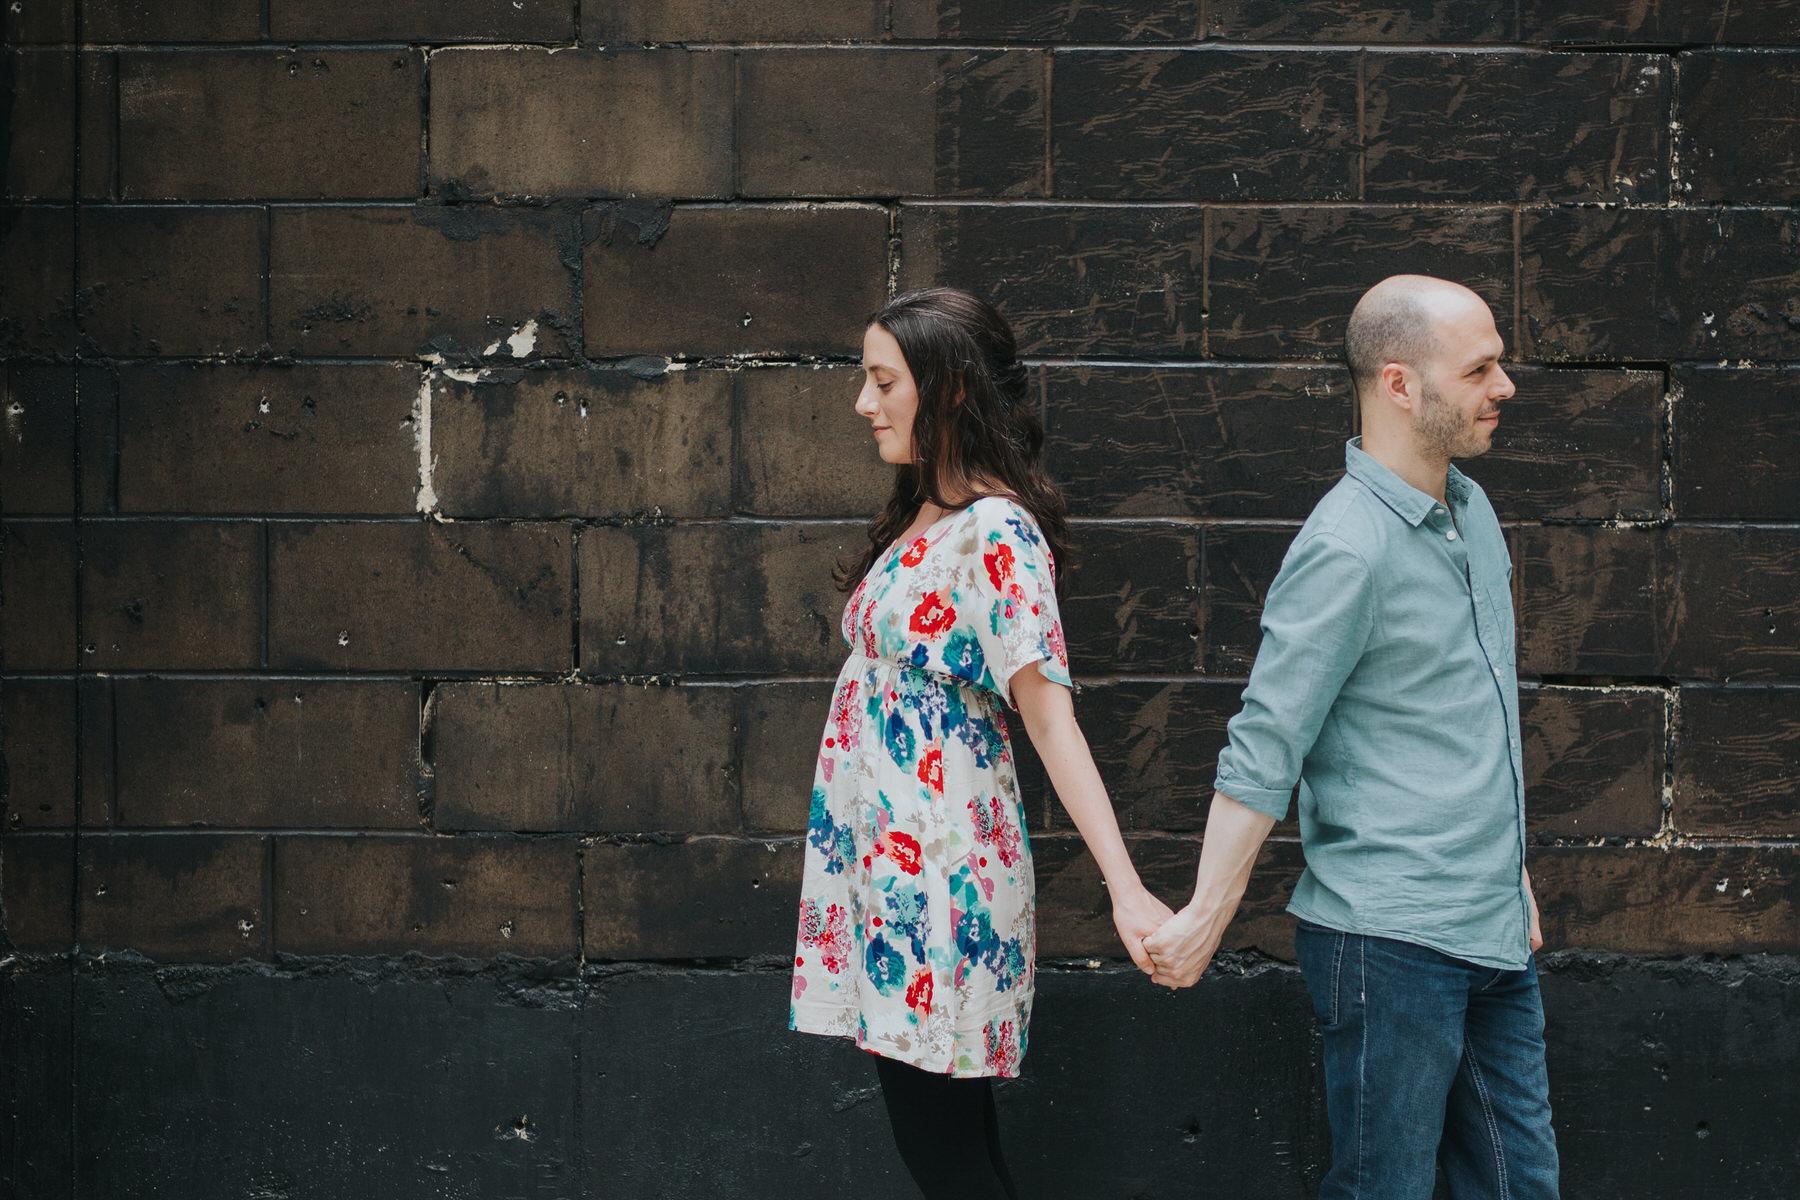 15-couple cuddling against urban background London.jpg